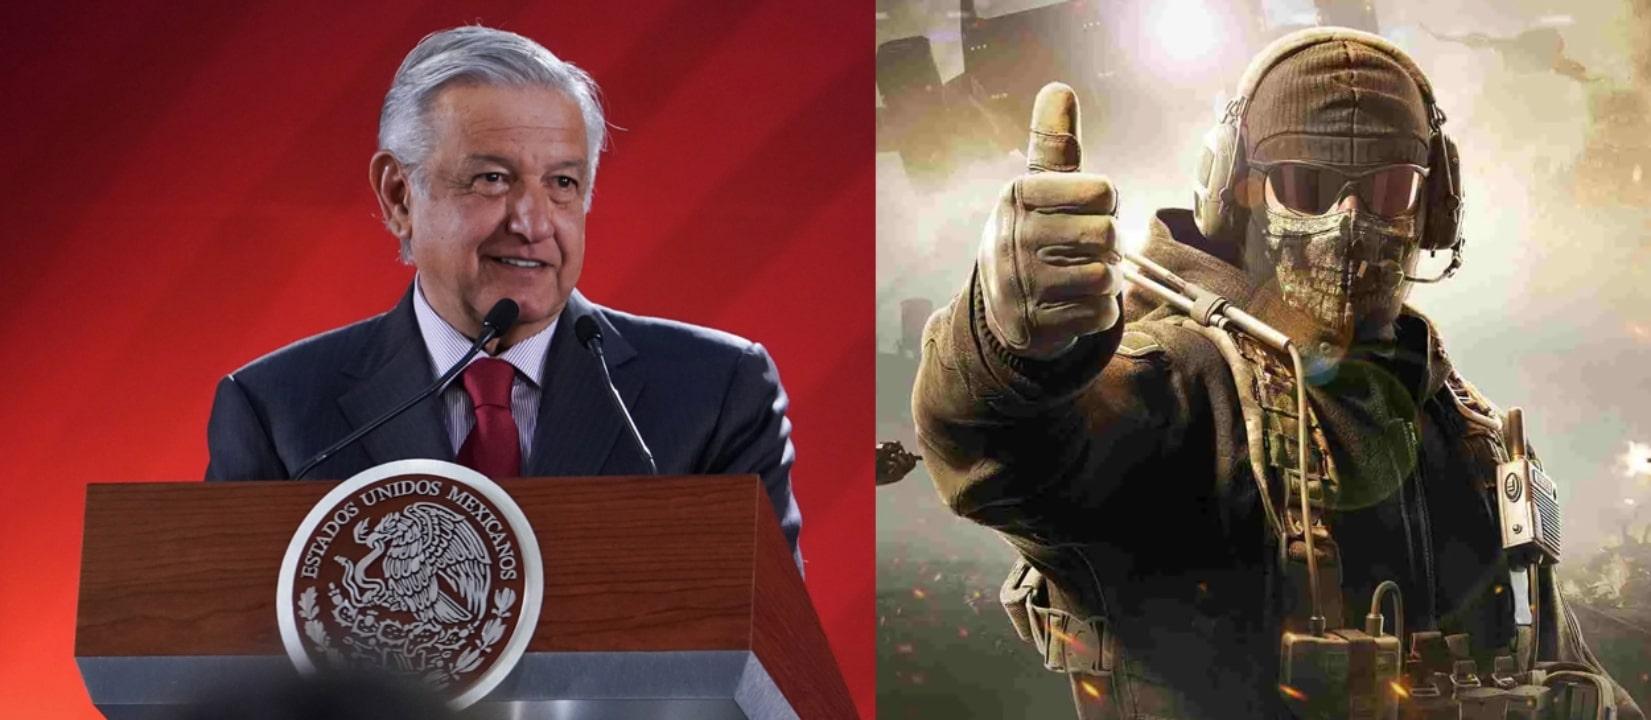 Videojuegos-violencia-mexico-Presidente